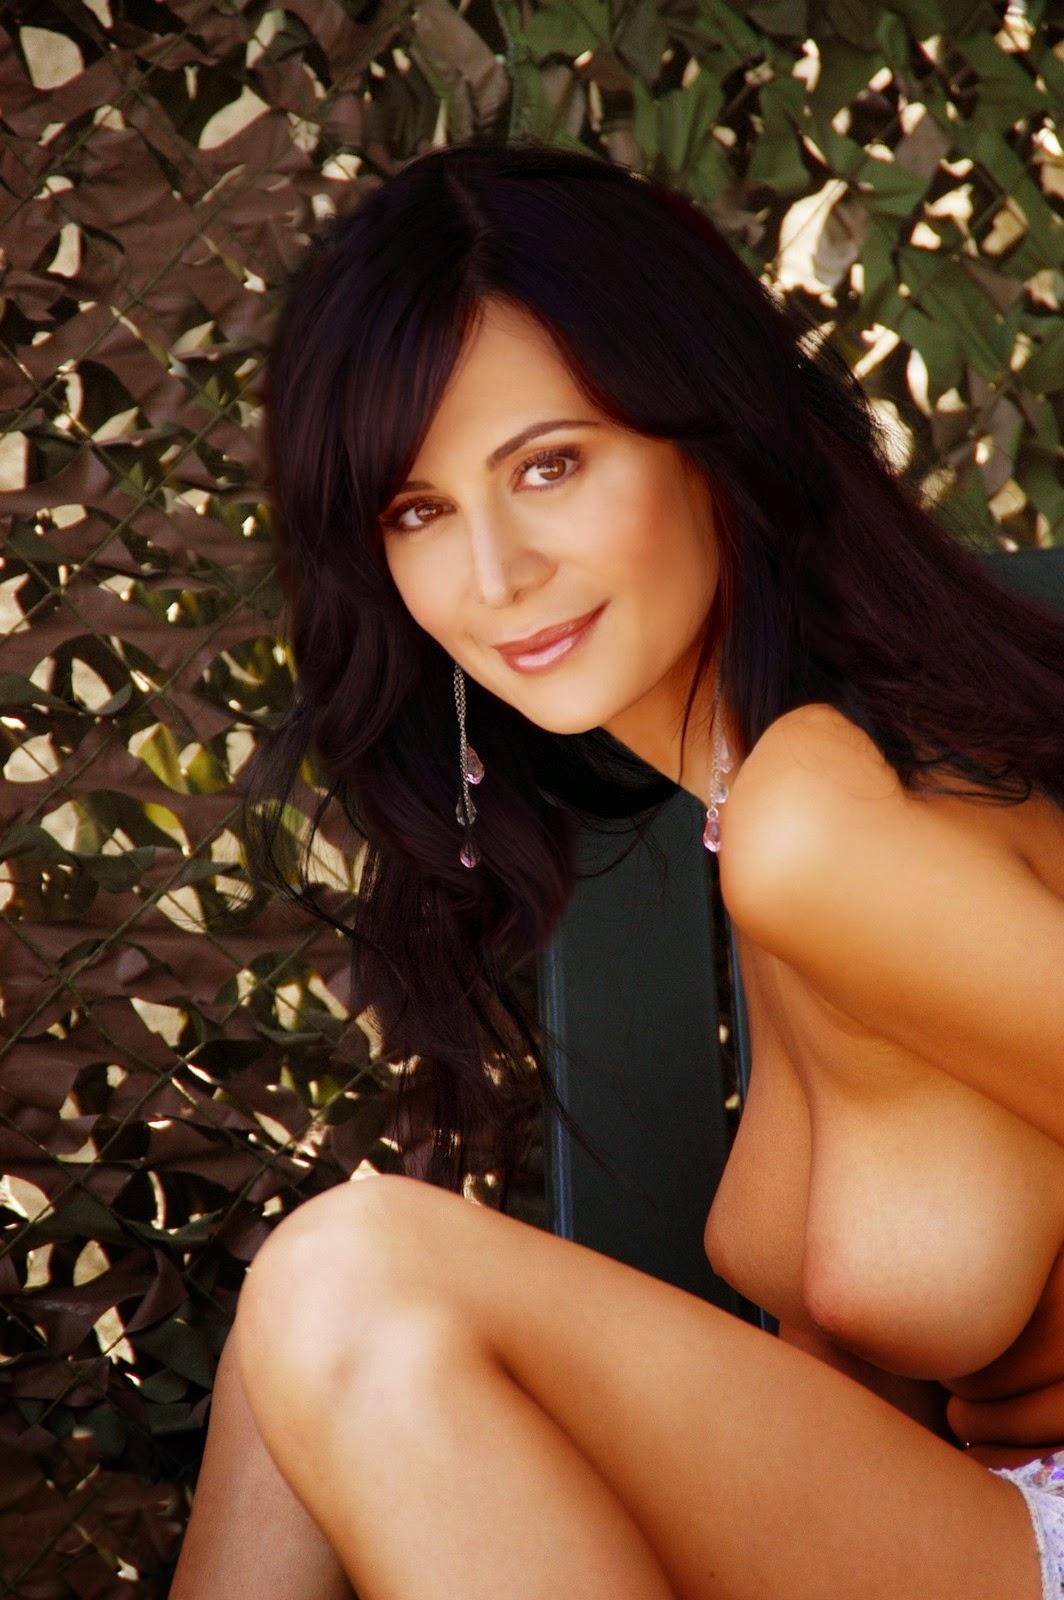 Nackt Bilder : Catherine Bell Naked Galery   nackter arsch.com